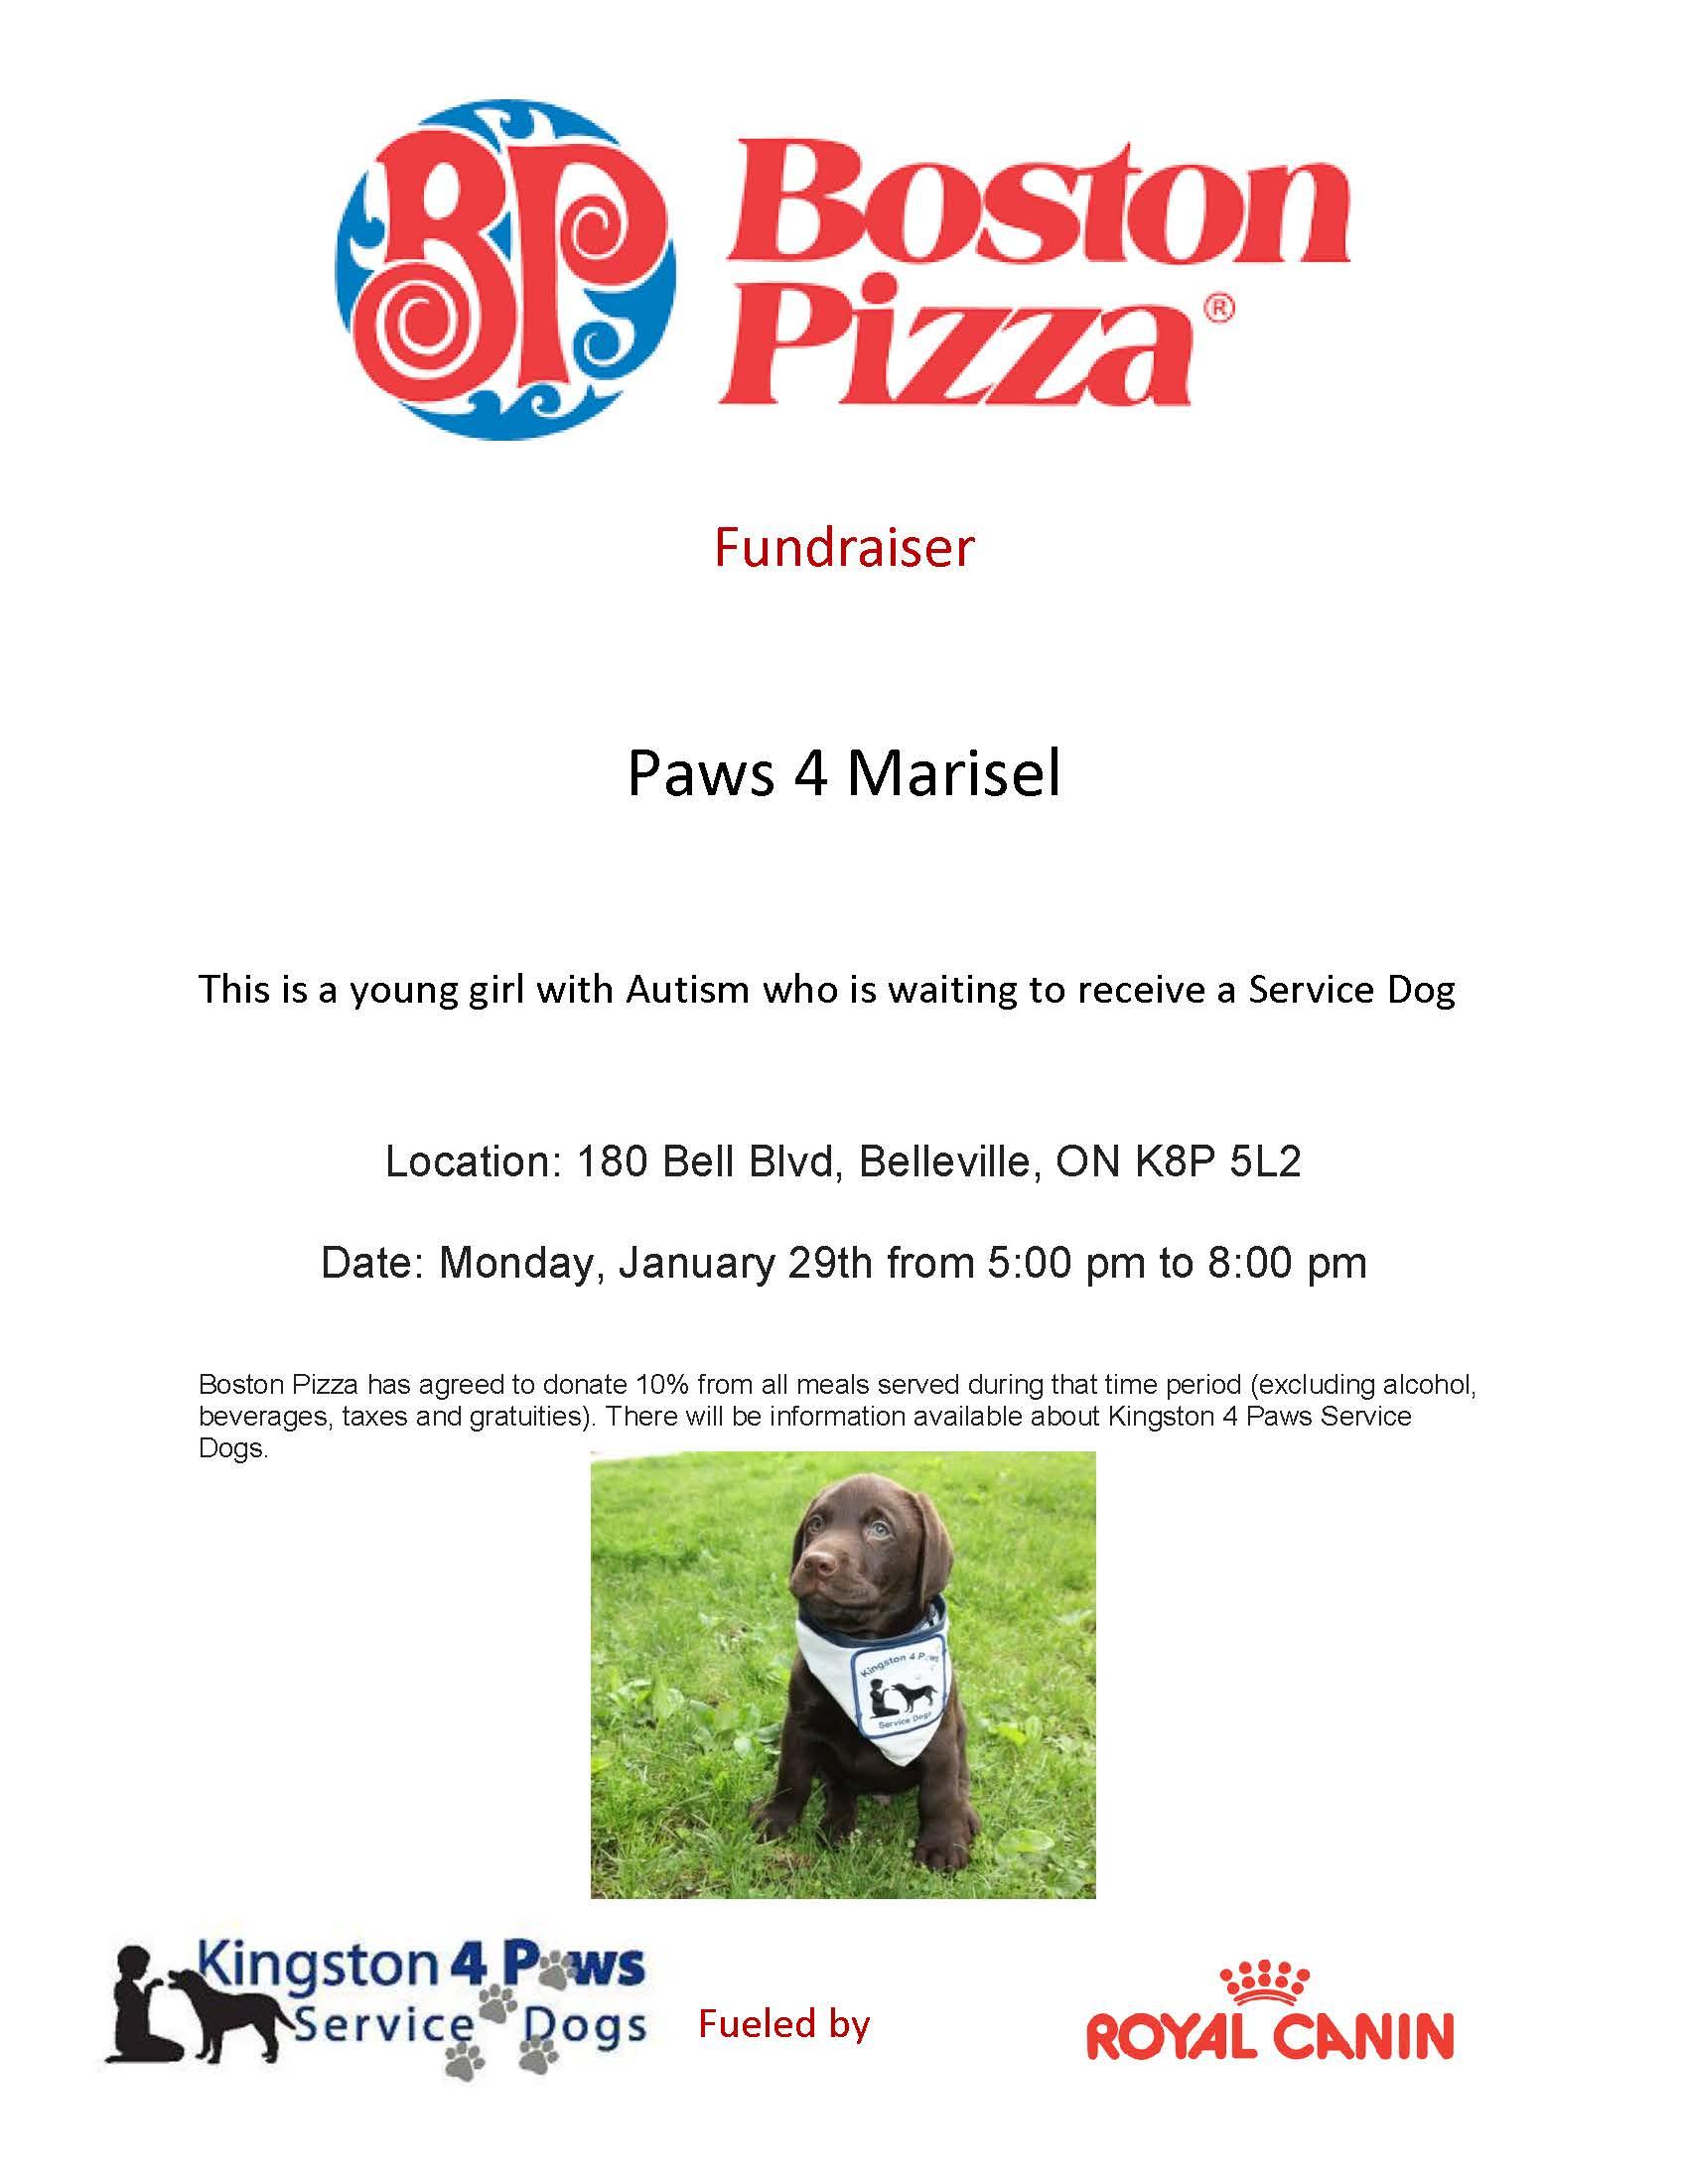 Boston Pizza Fundraiser for Marisel